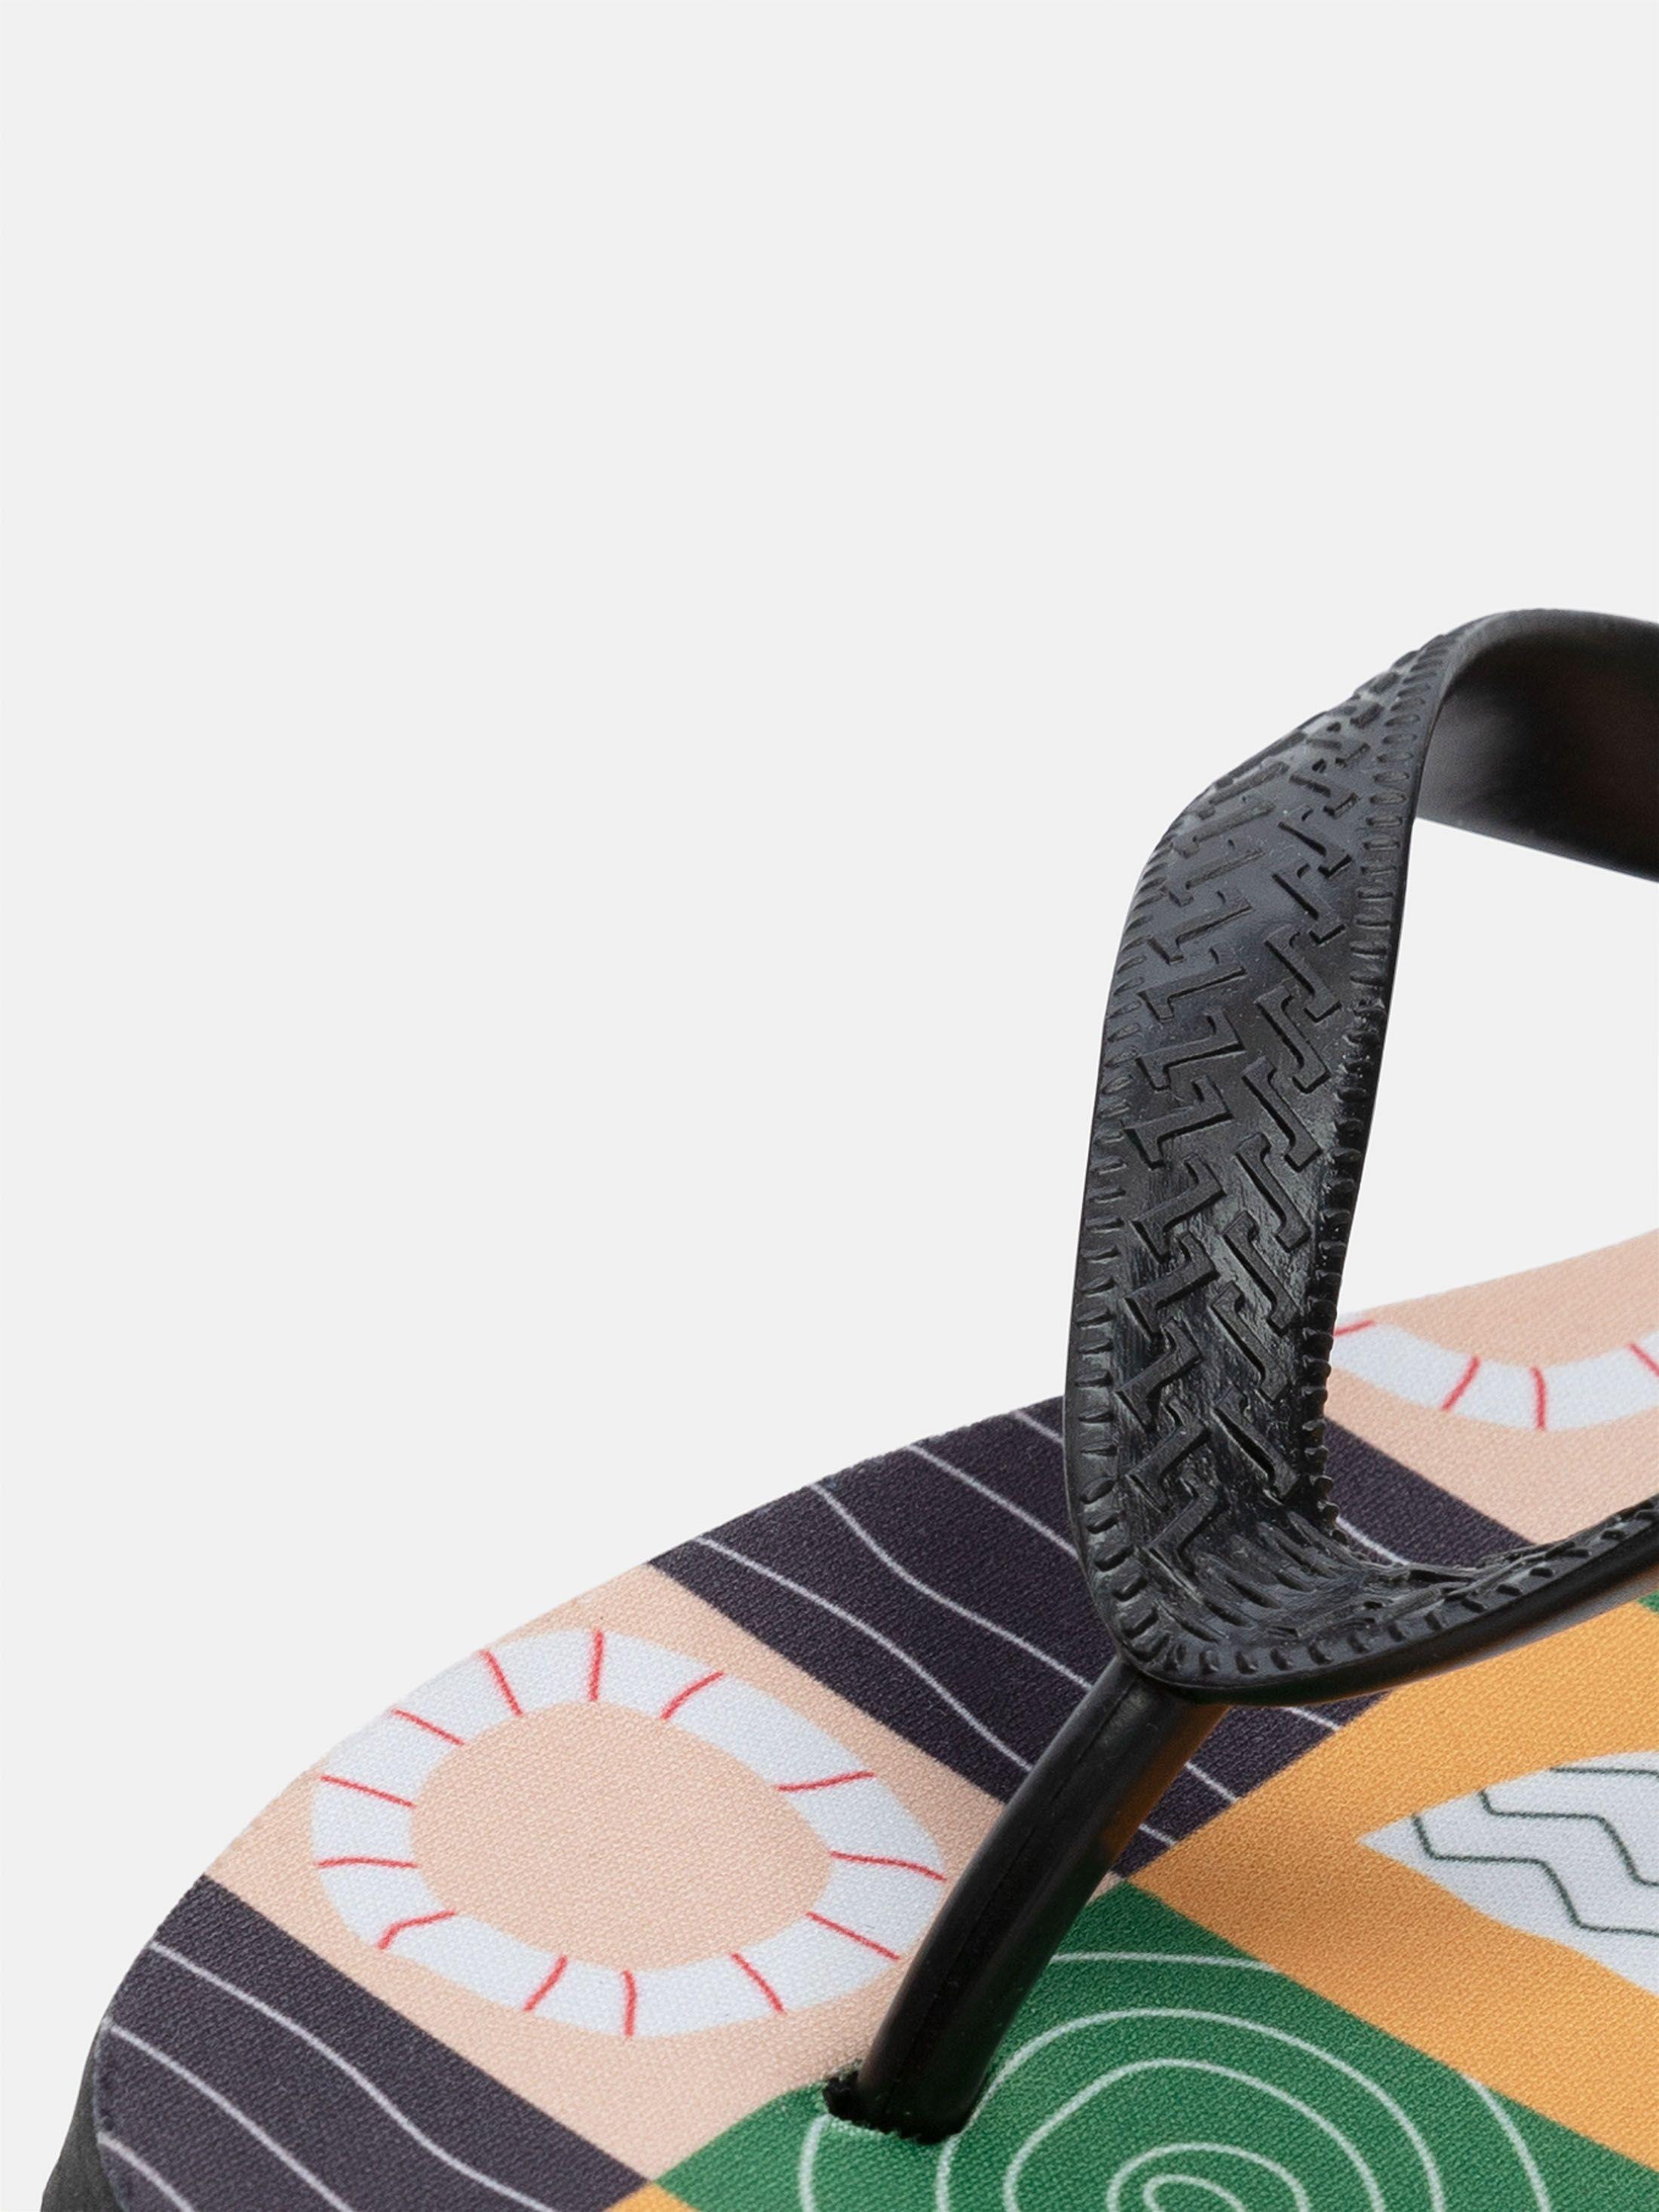 Design Children's Flip Flops